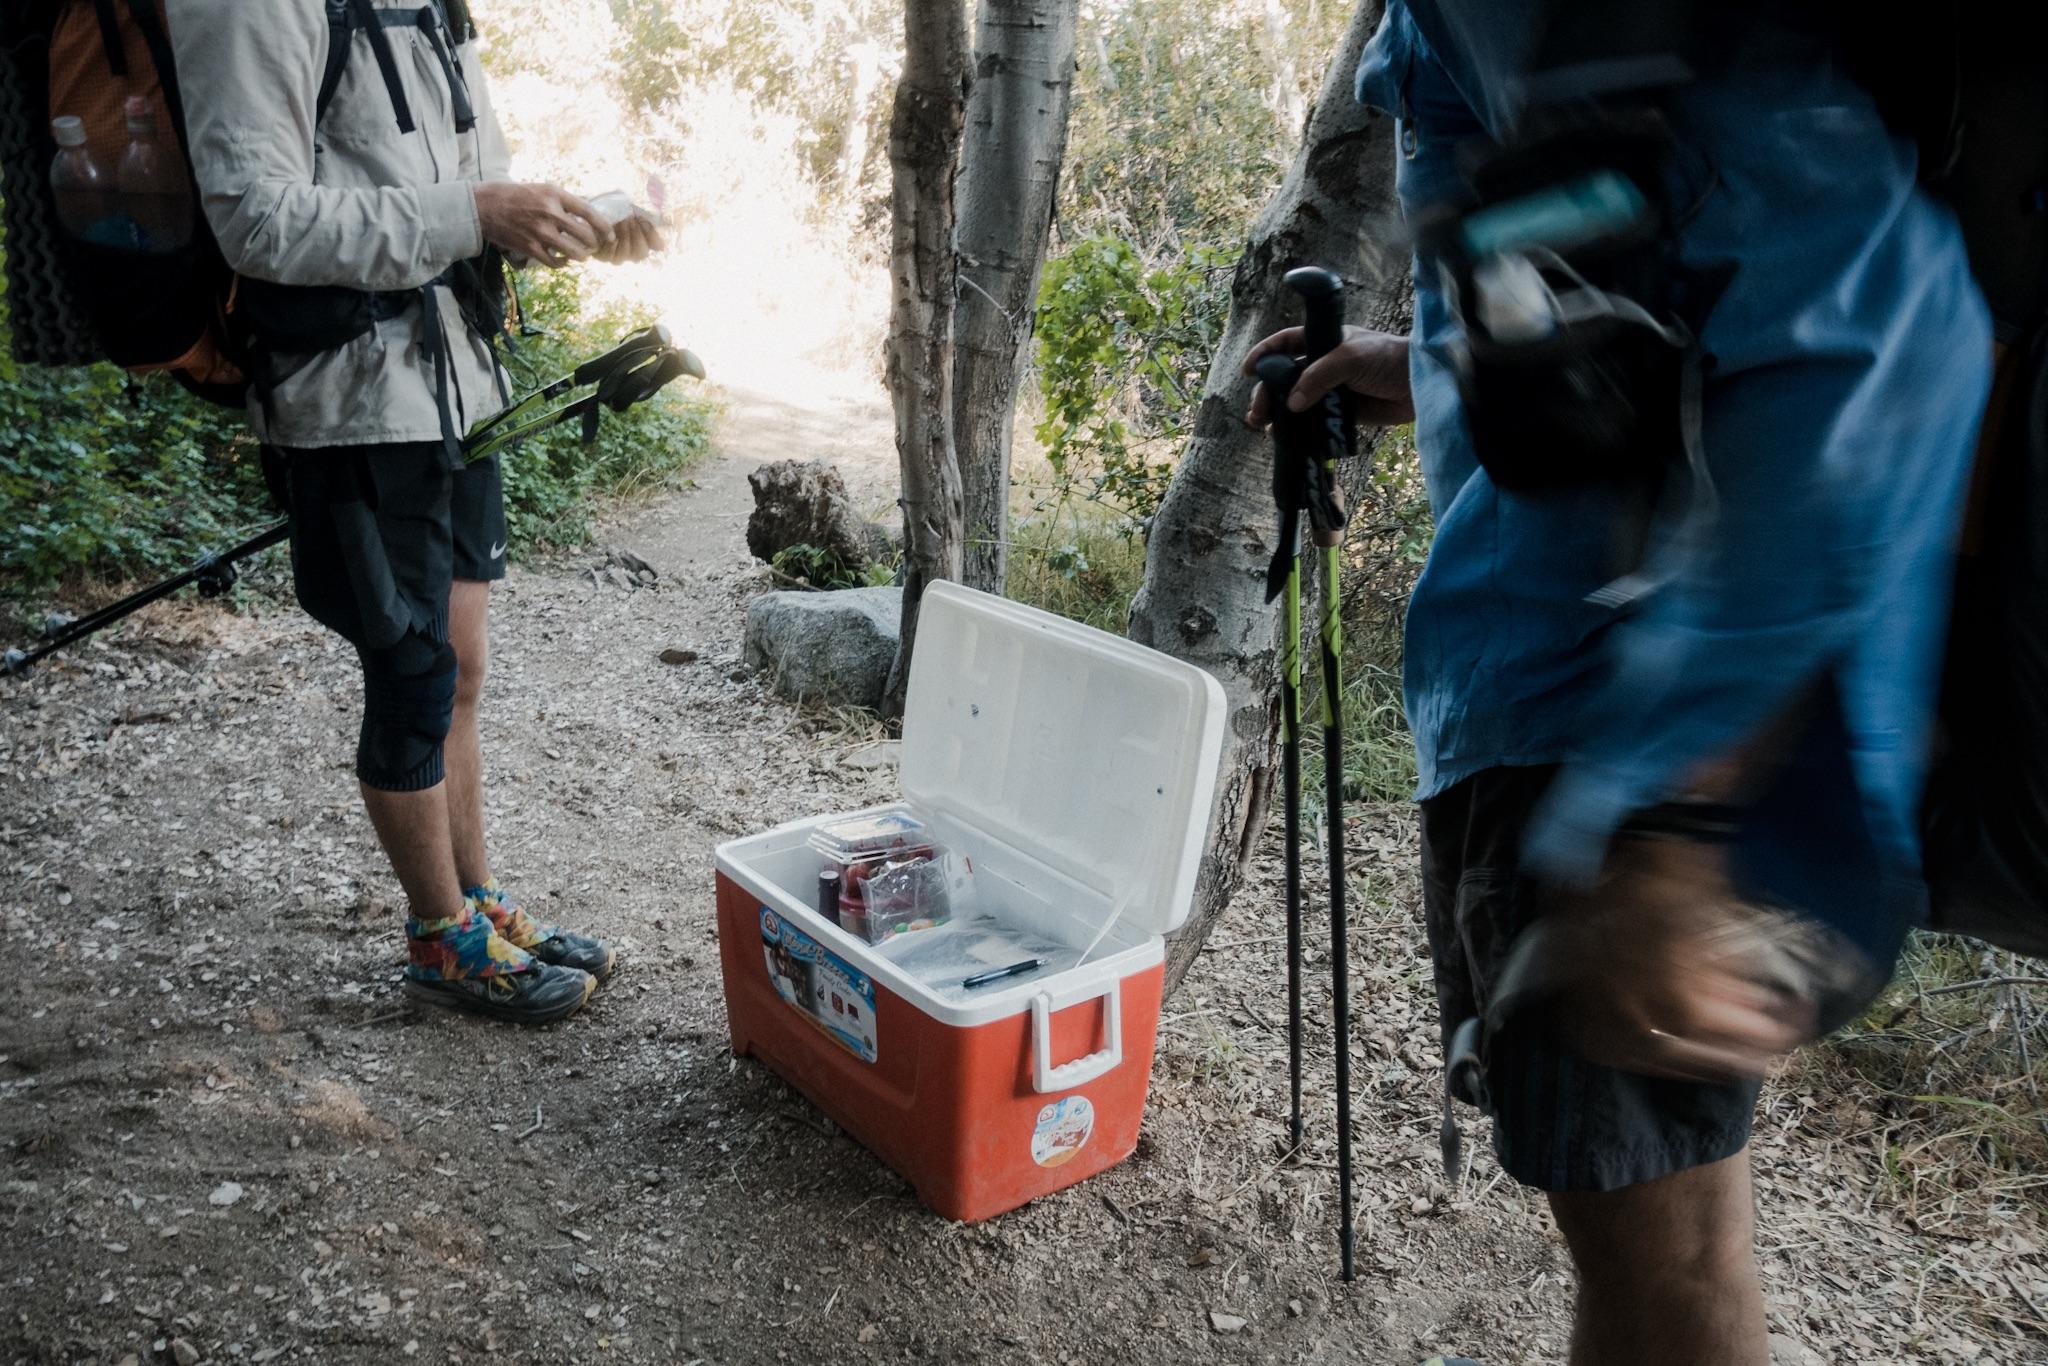 Trail magic.